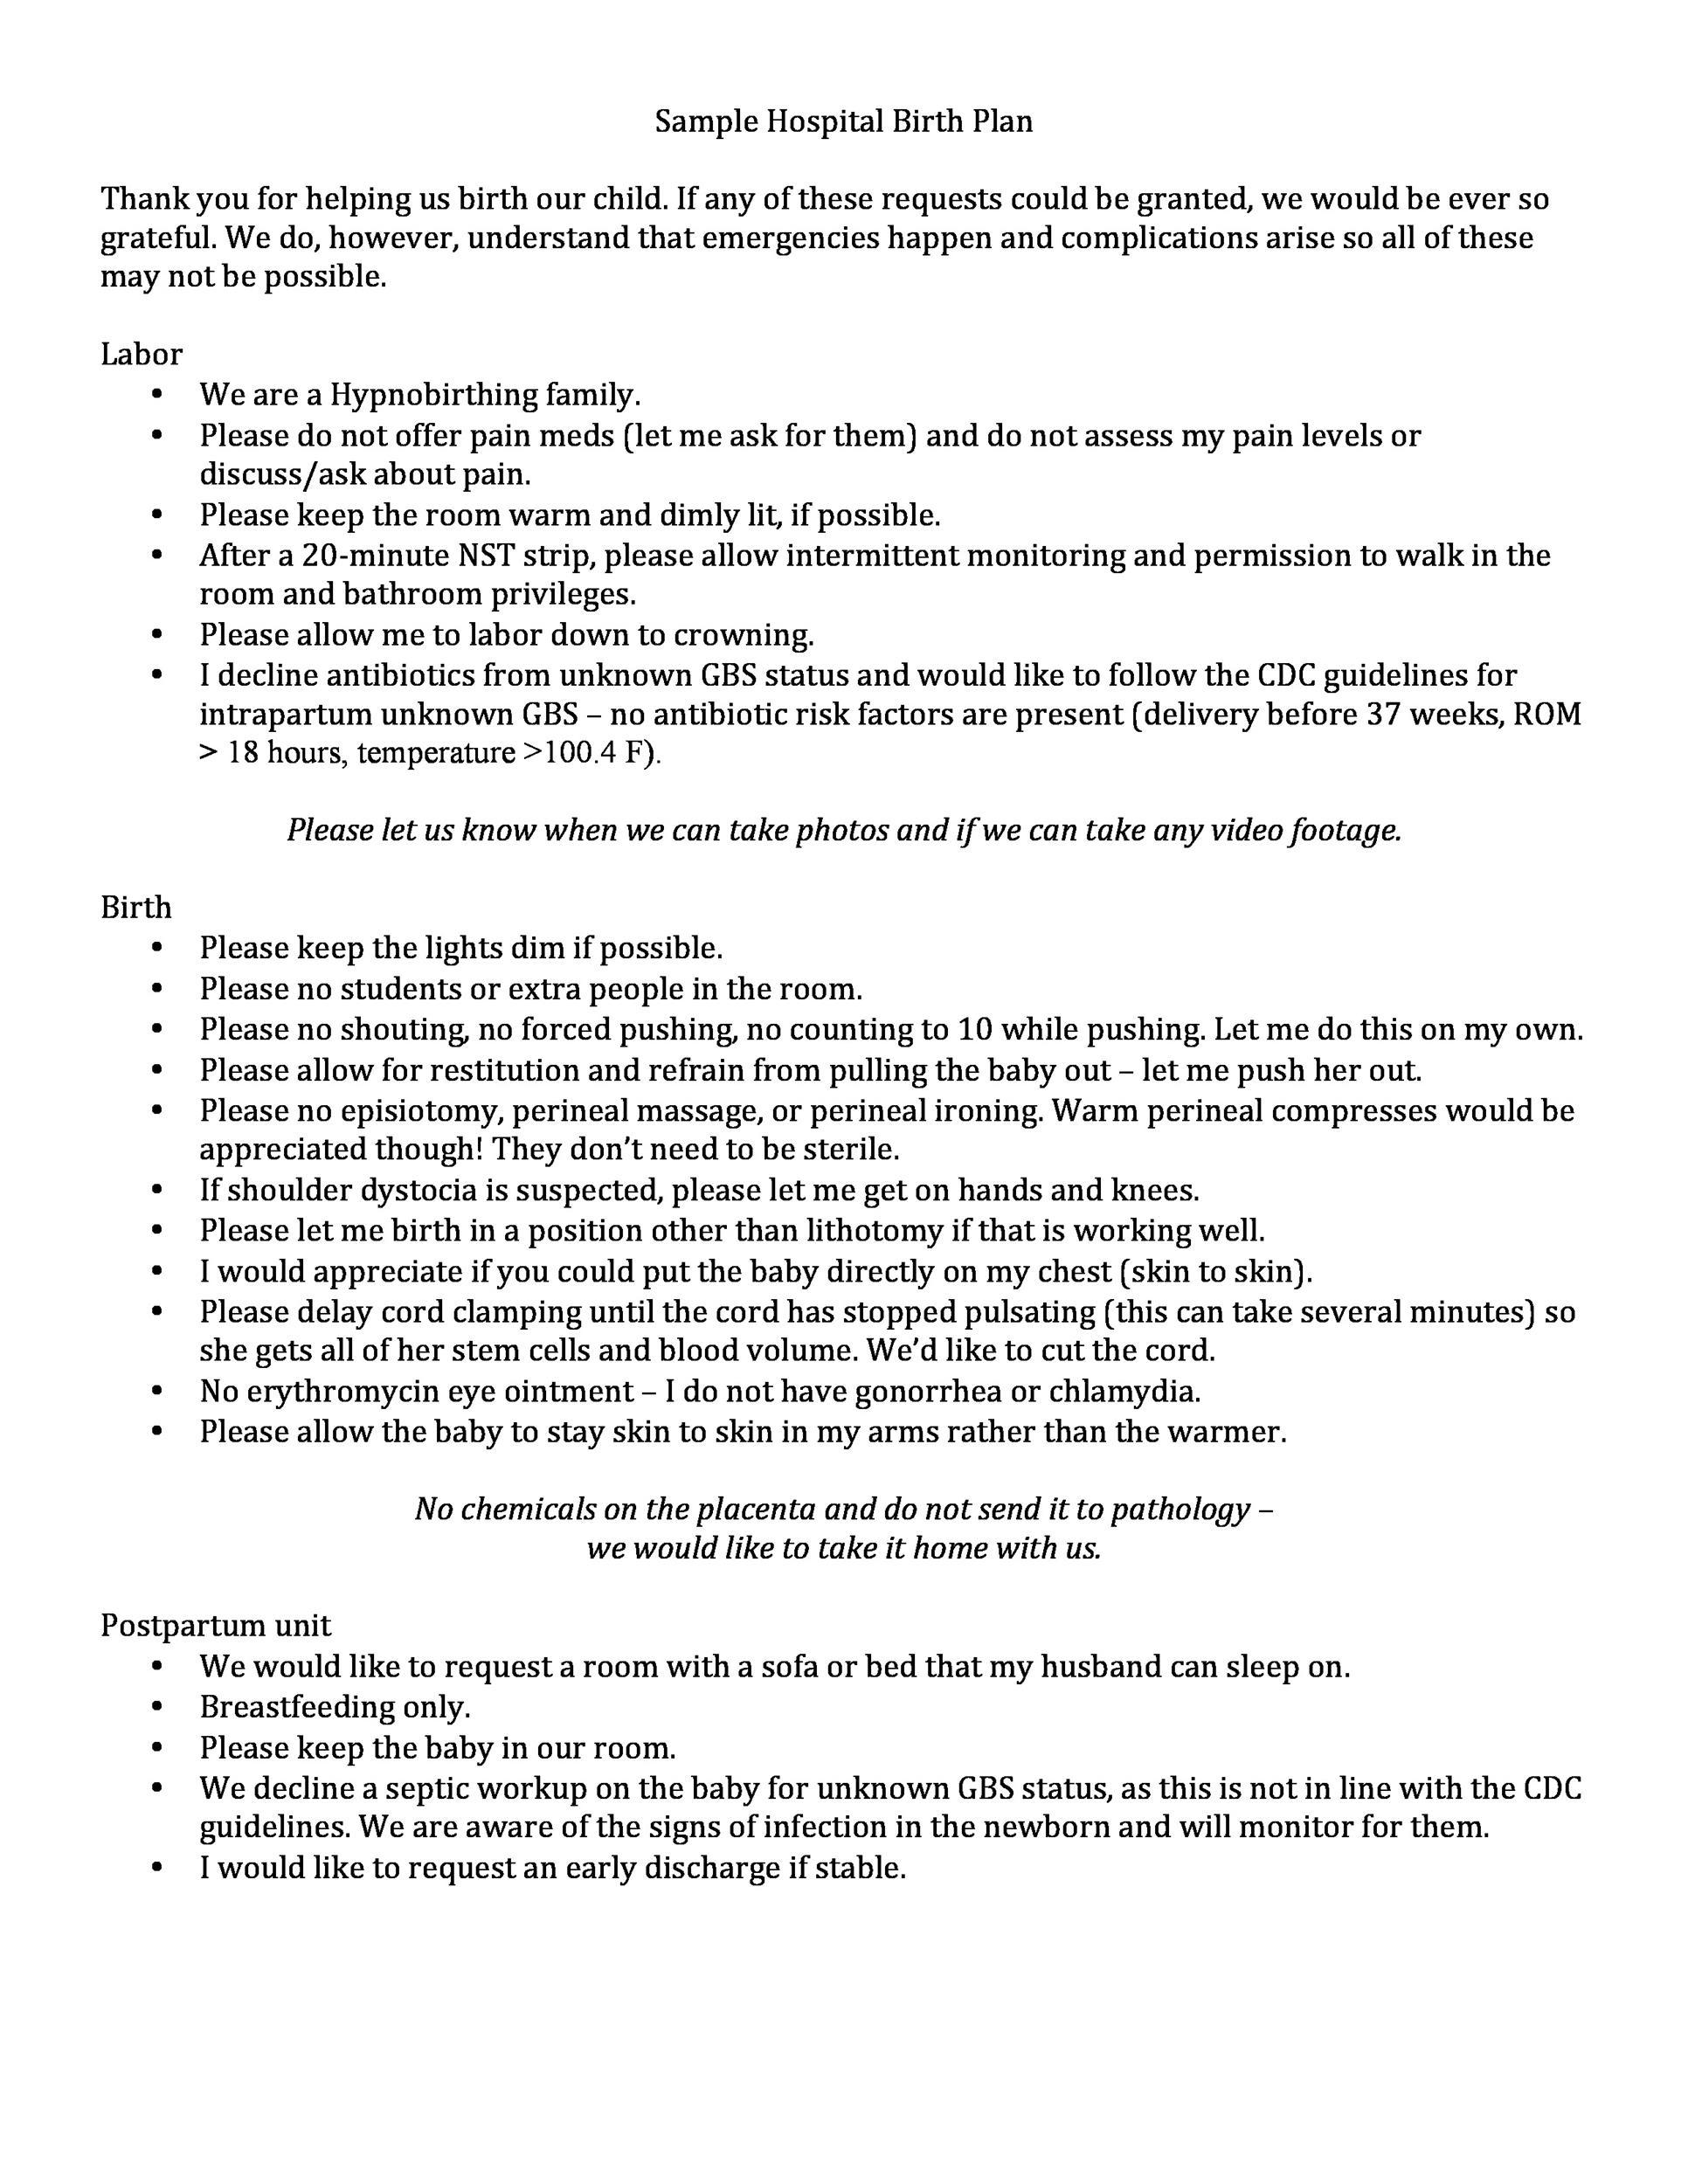 47+ printable birth plan templates [birth plan checklist] - template lab